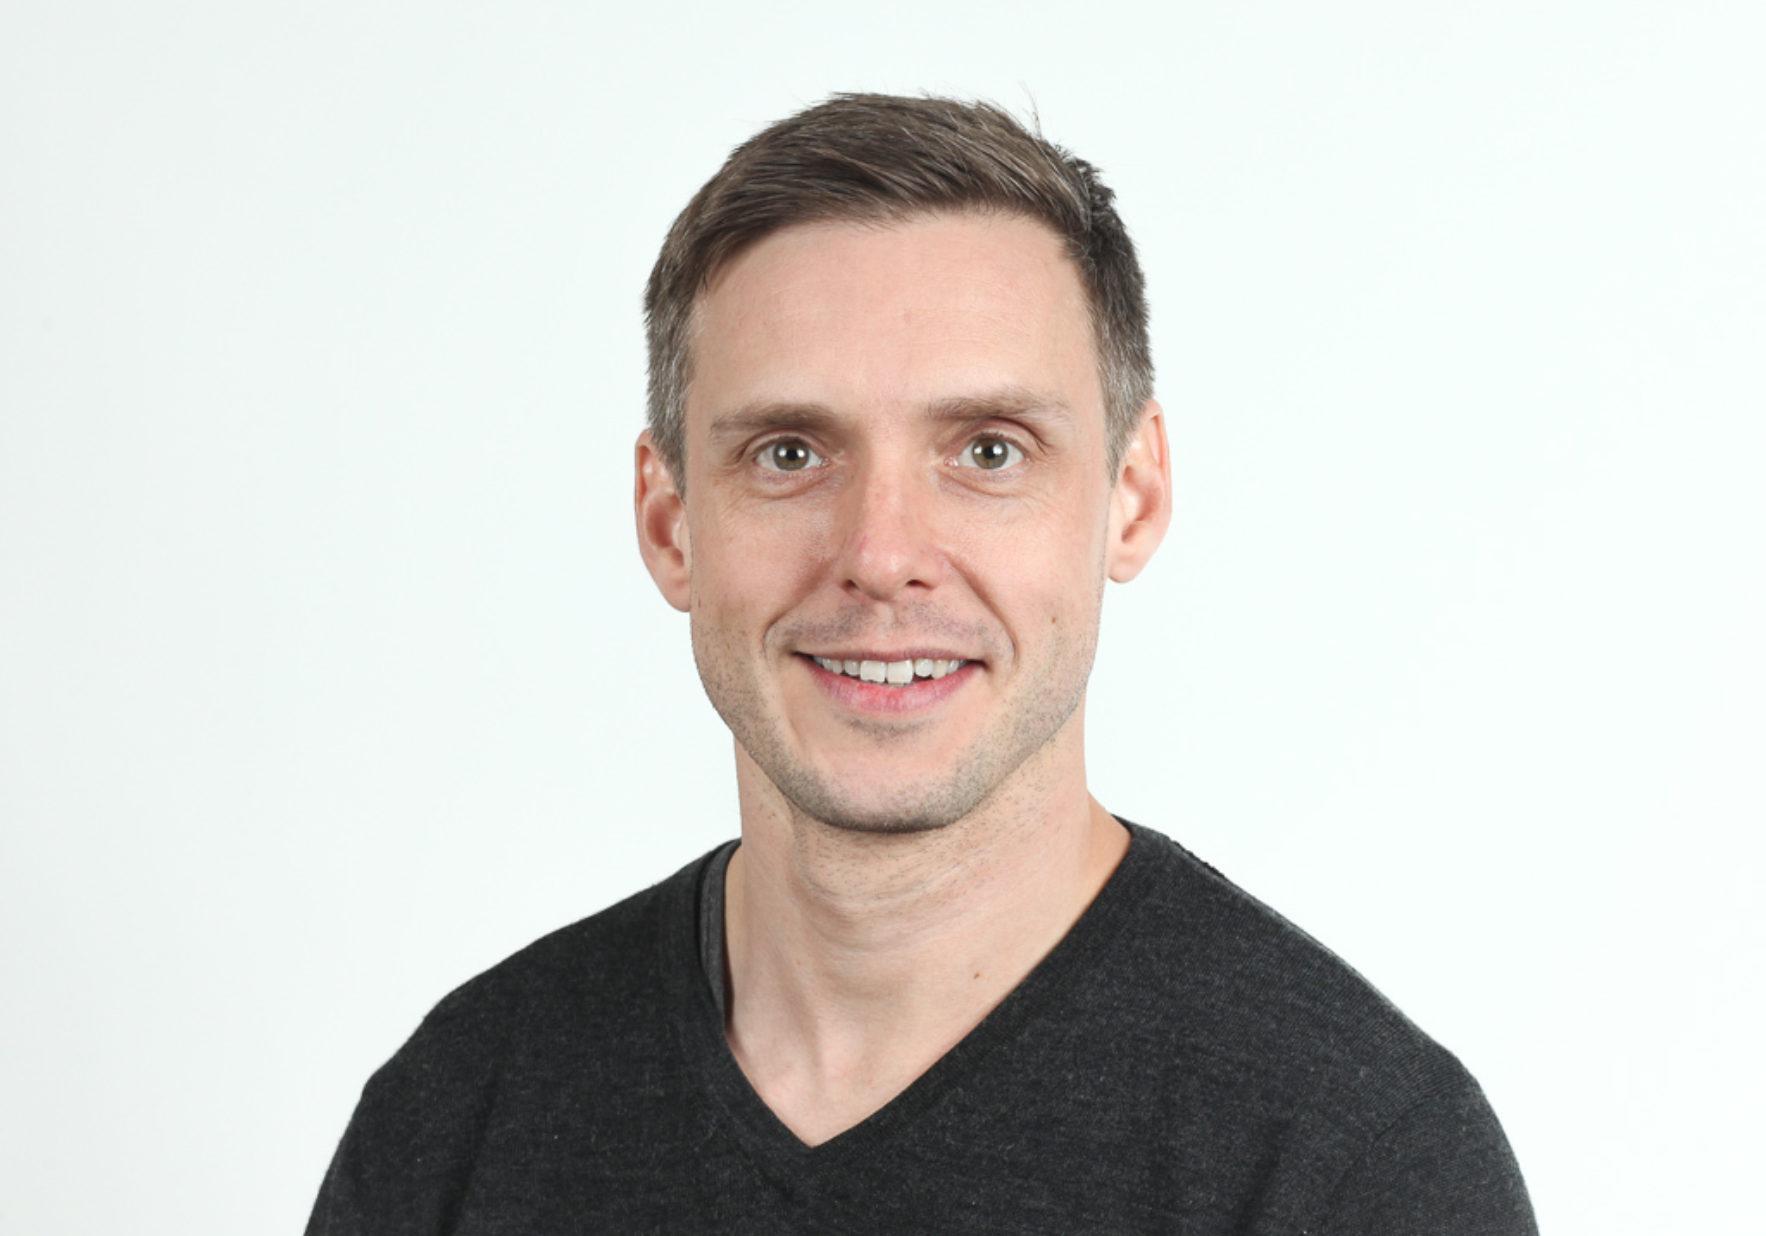 Tim Bartels